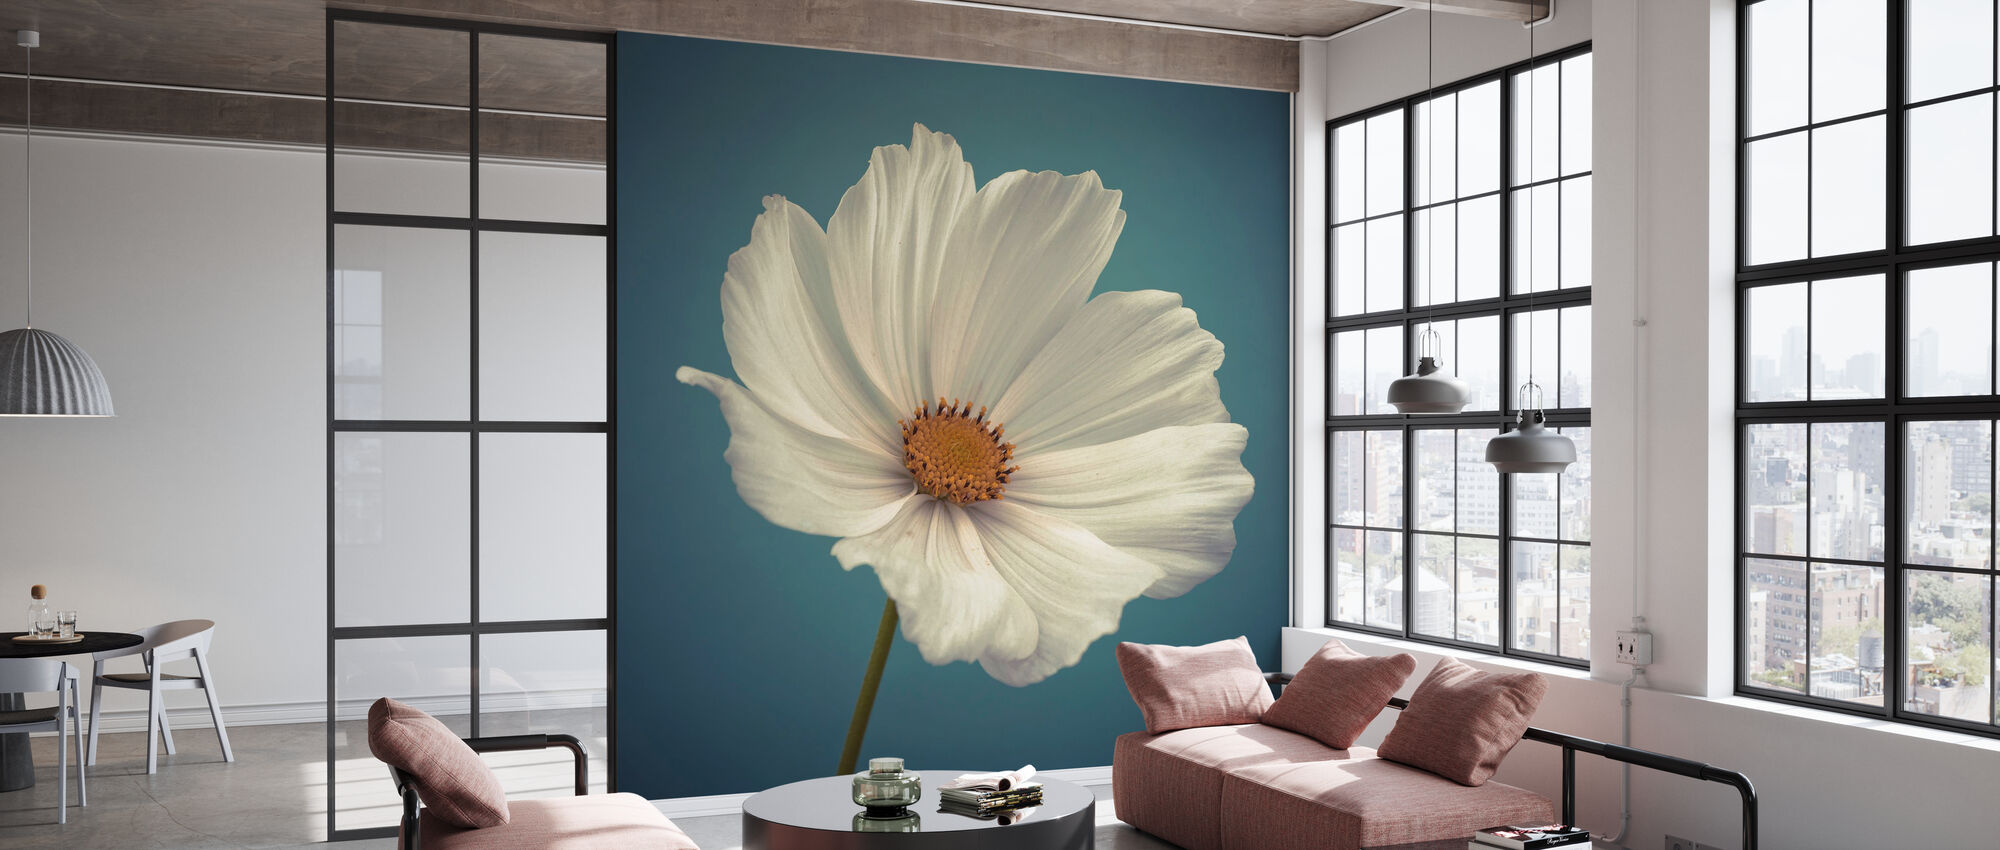 Cosmos - Wallpaper - Office